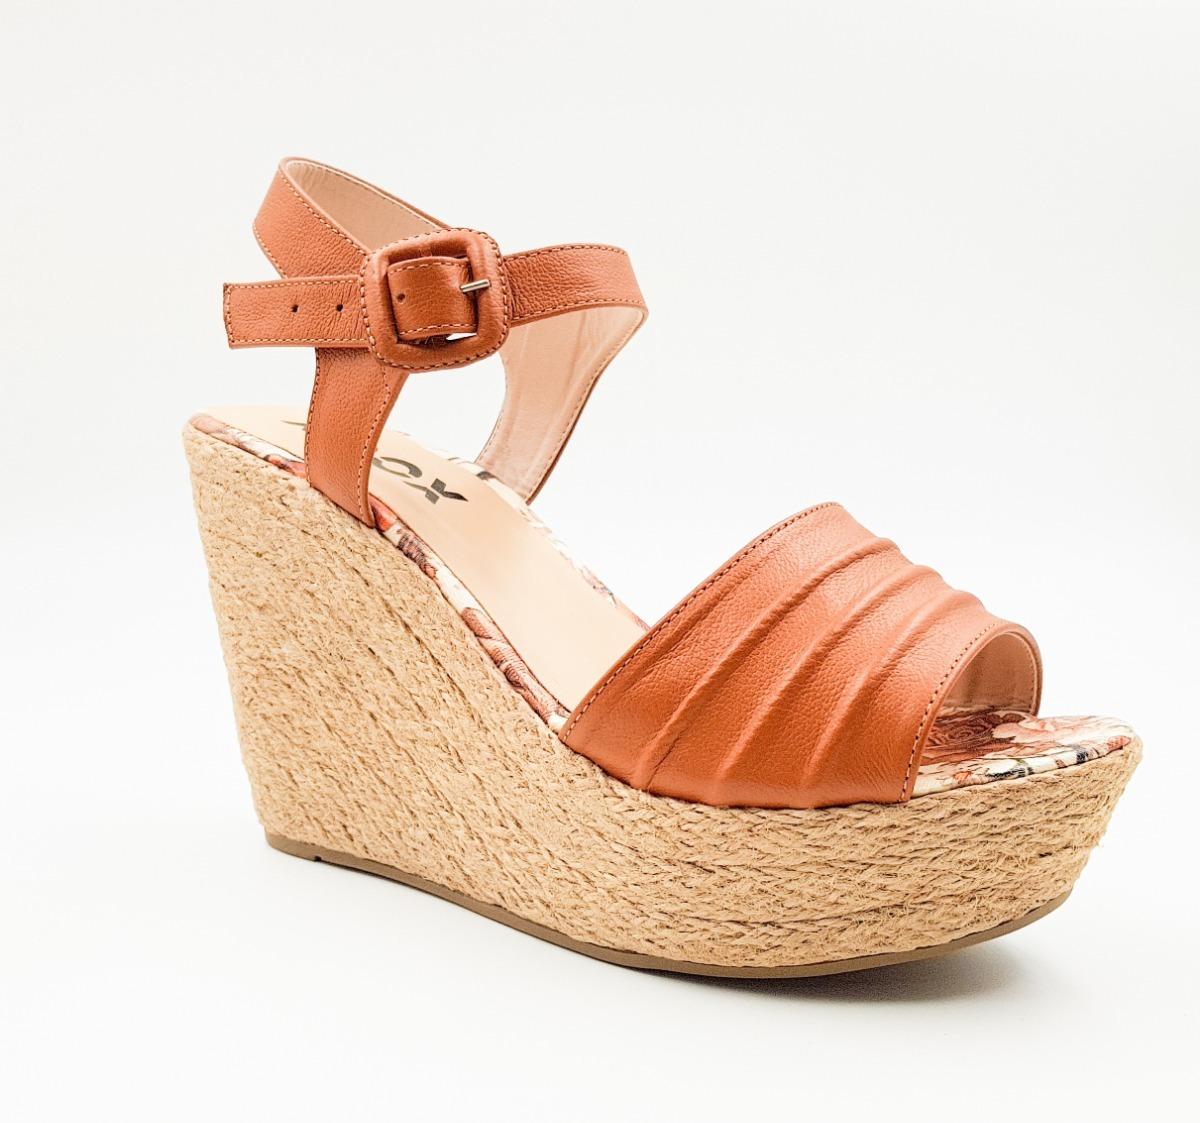 Tipo 100colombiano Tacón Sandalia Mujercalzado Para G6by7f EY9IeH2DbW